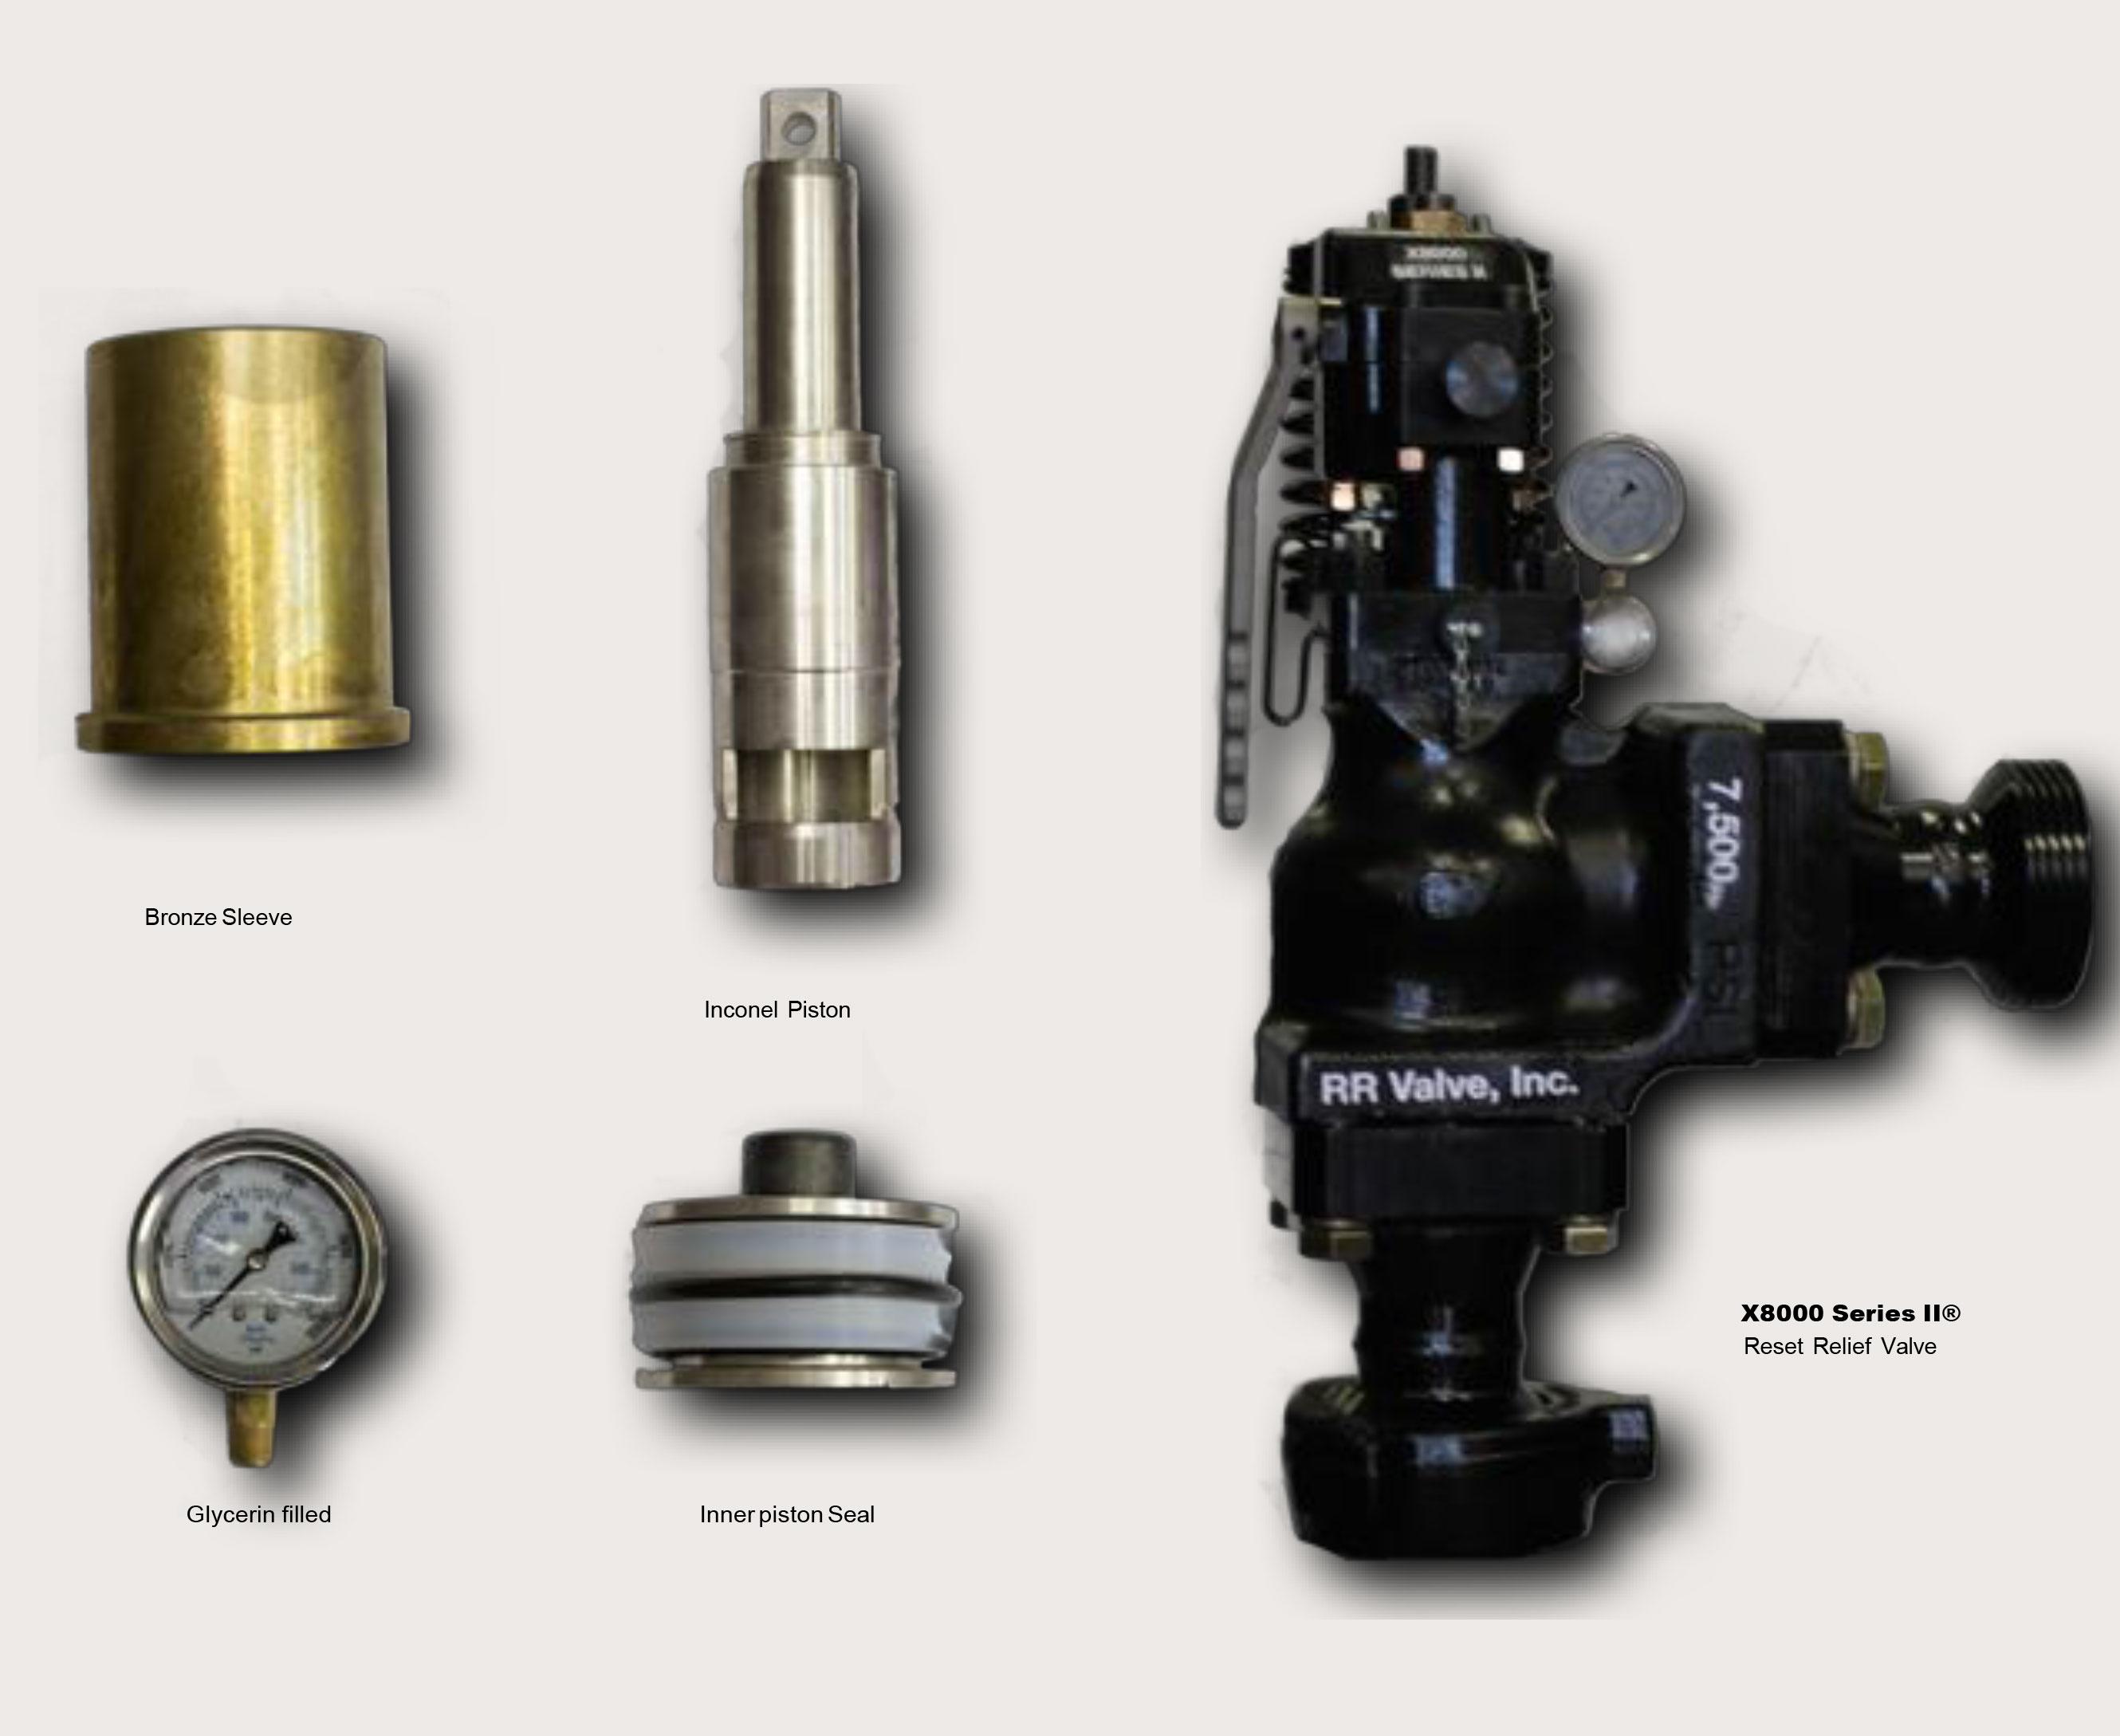 X8000-SERIES-II